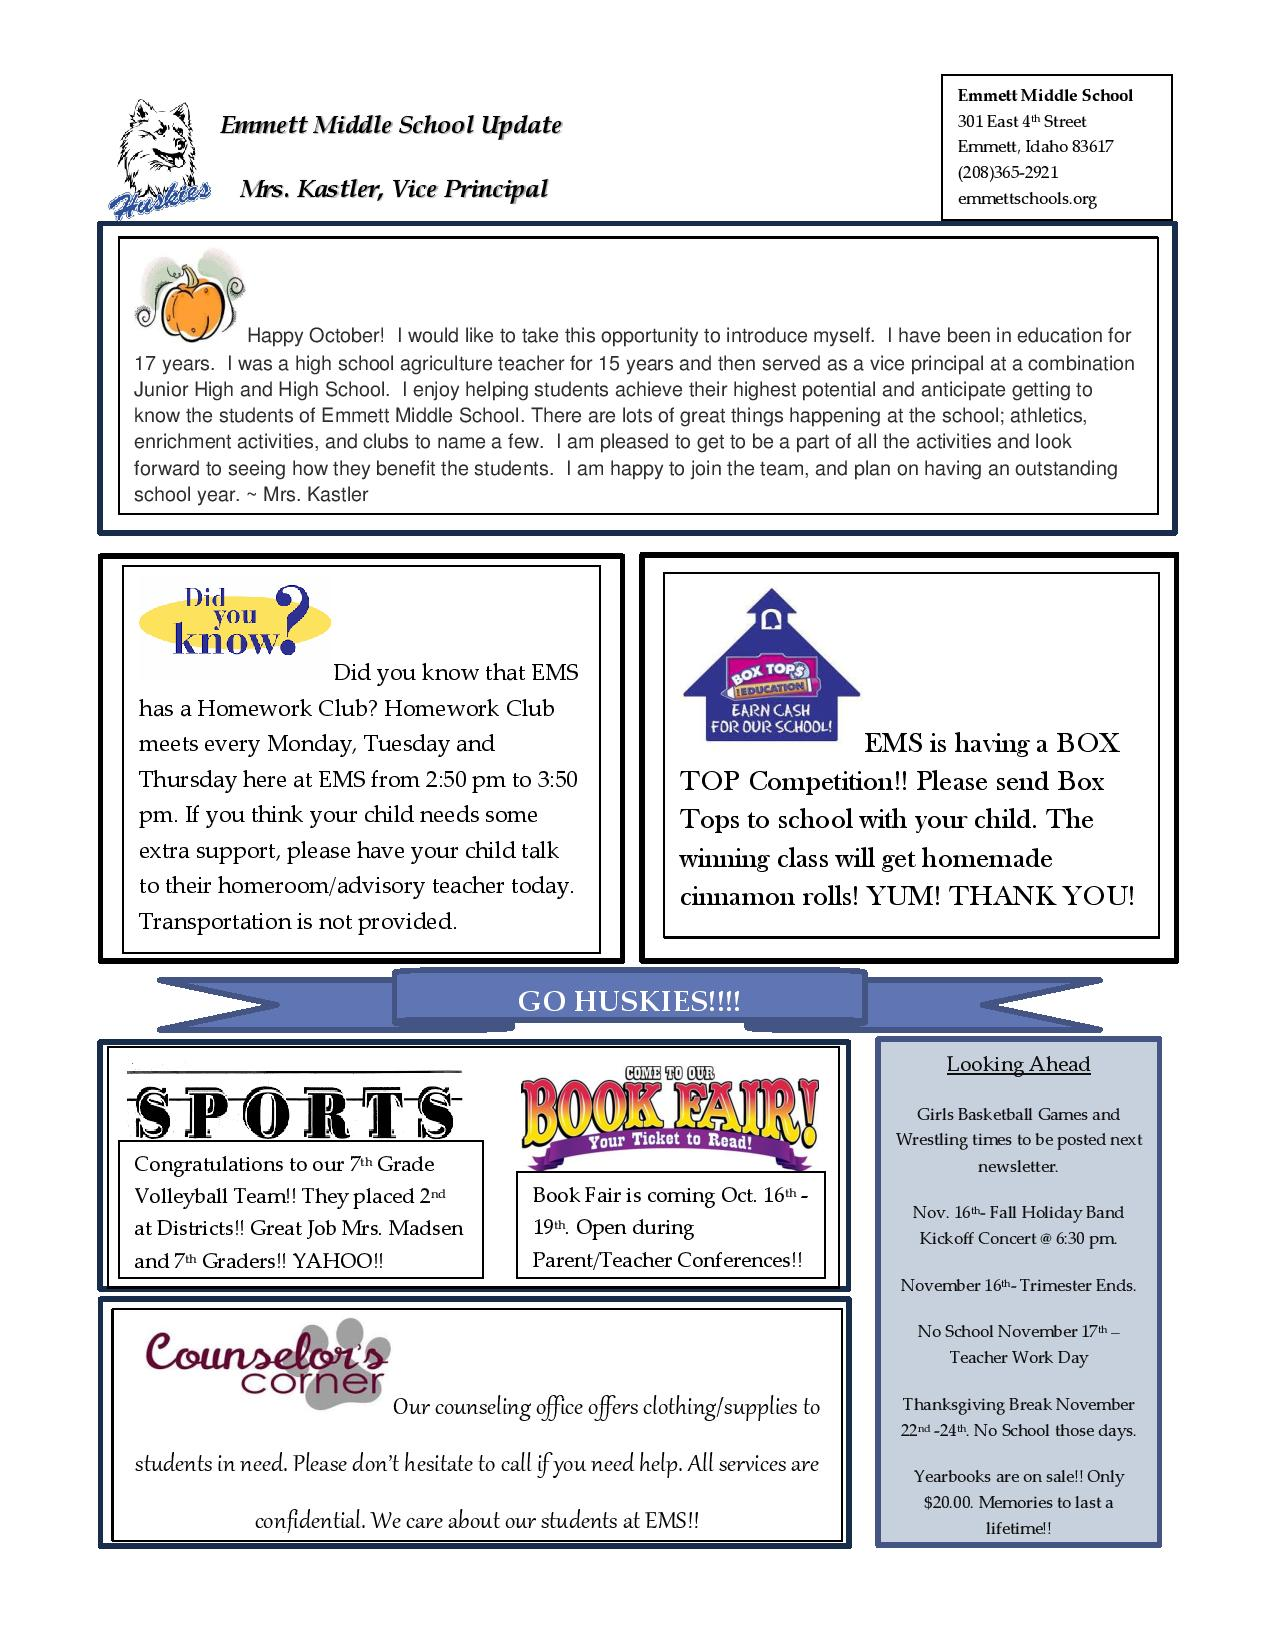 emmett middle school homepage